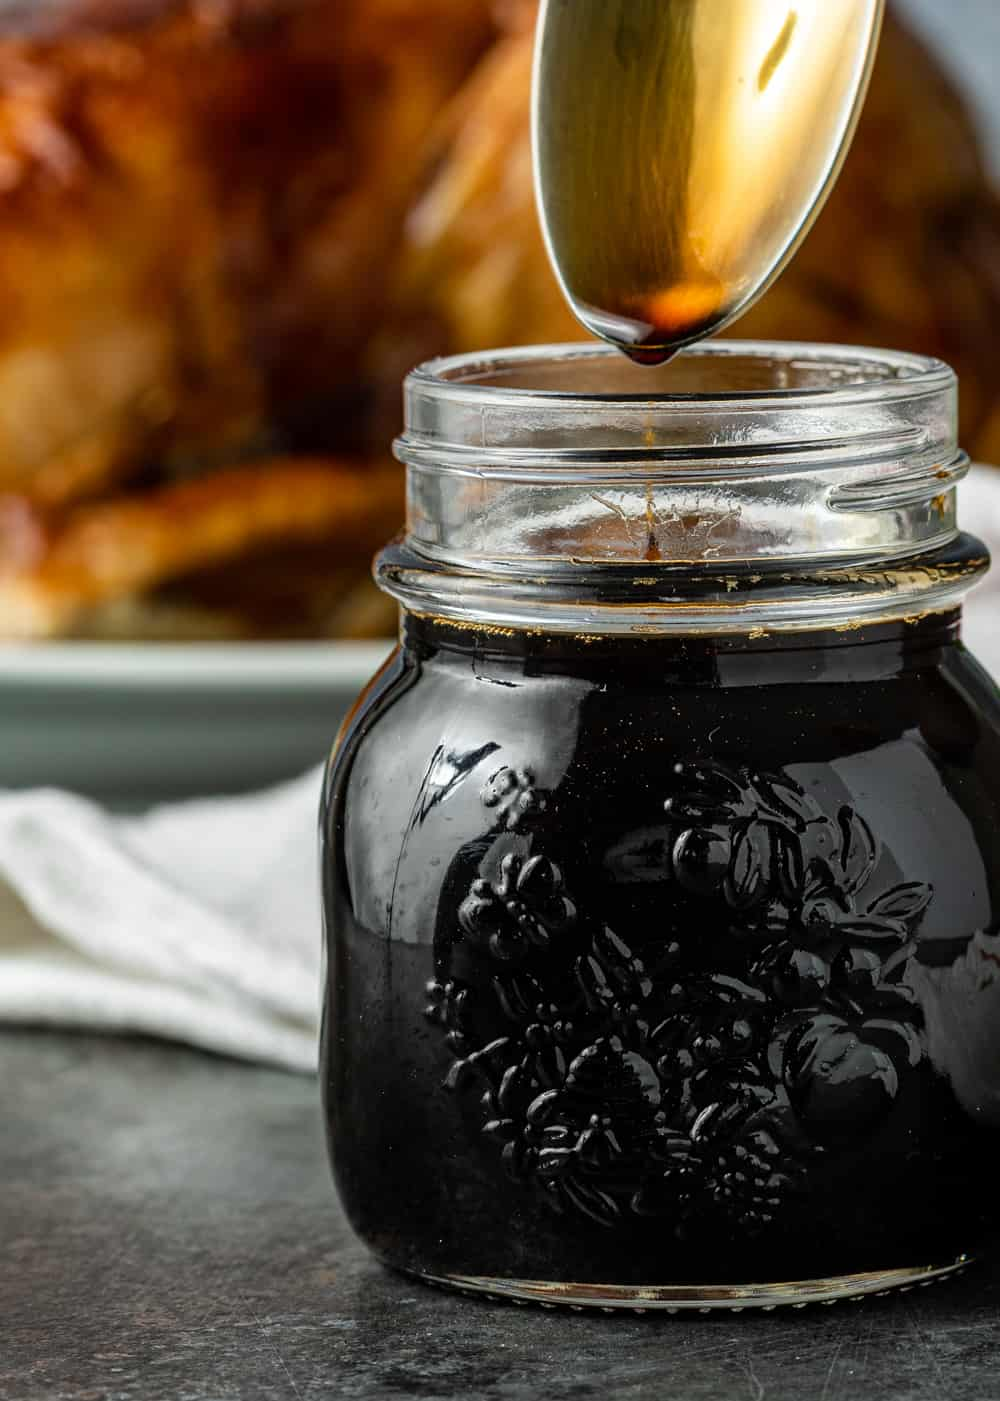 teriyaki sauce recipe dripping from spoon into a glass jar